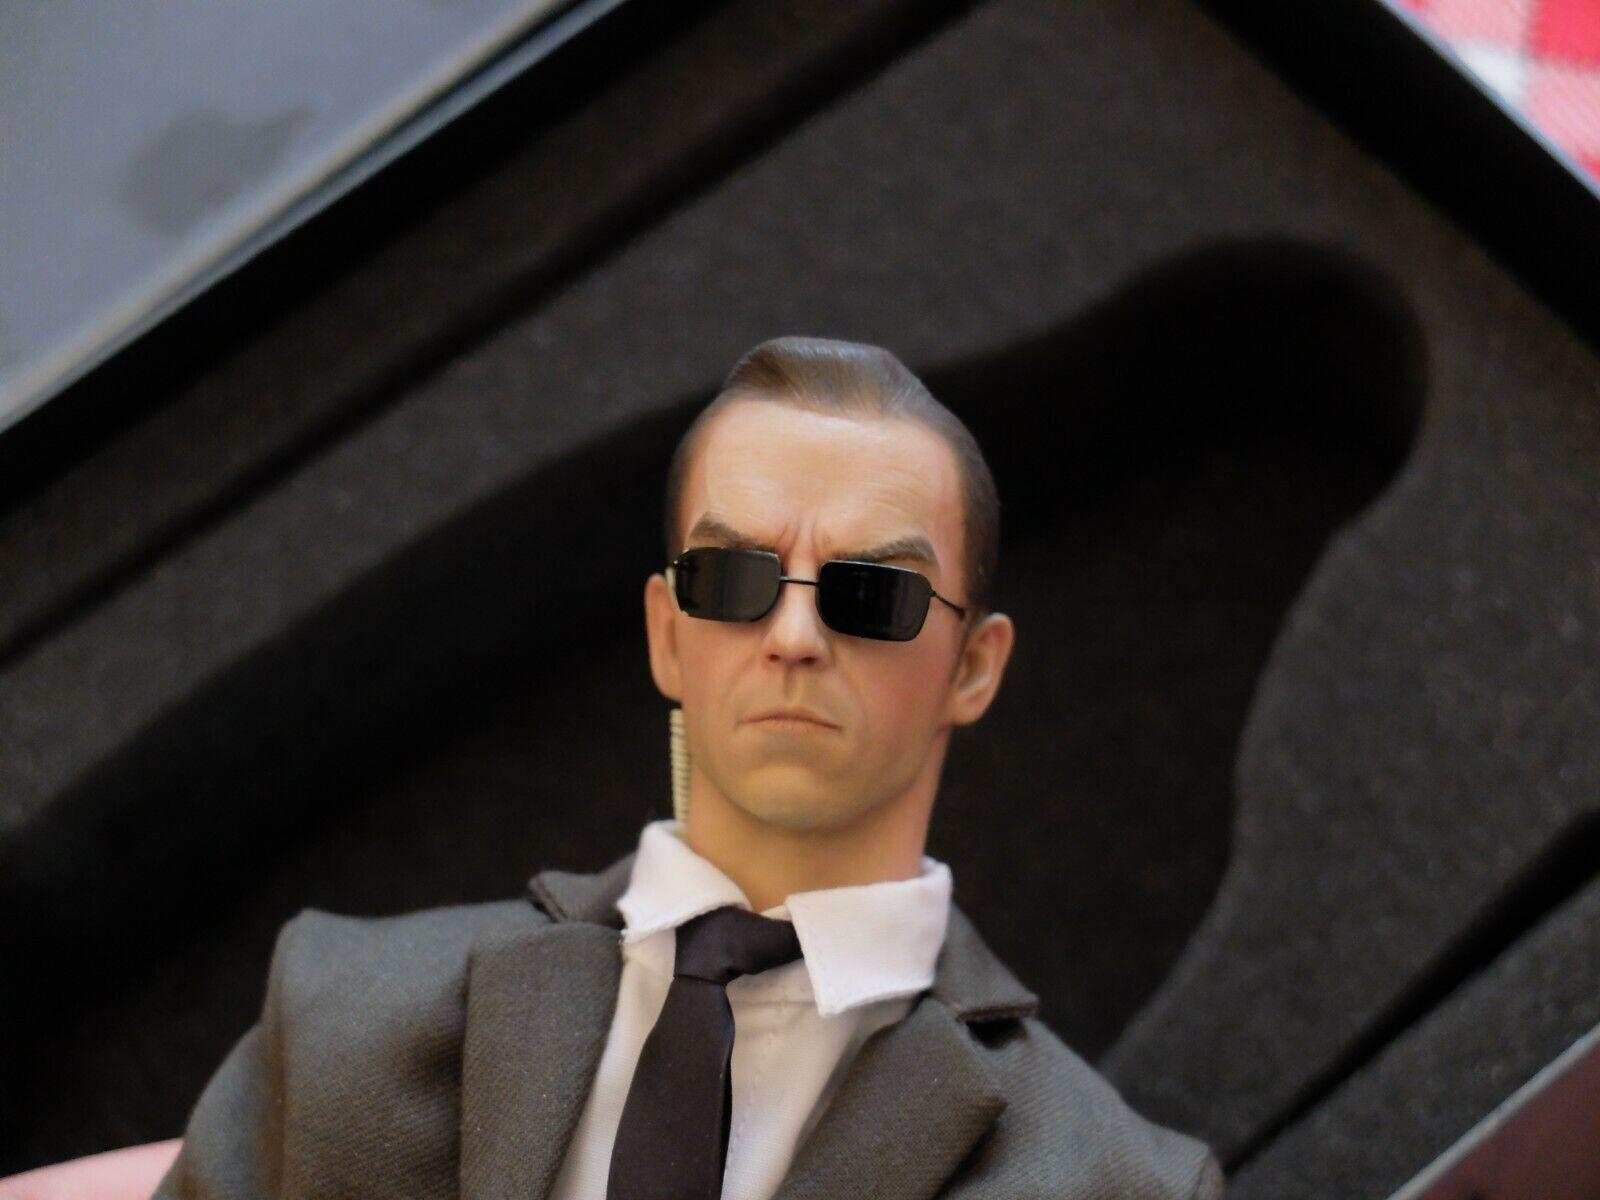 Agent Smith 1 6 scale Matrix Iminime   MasterWorks figure